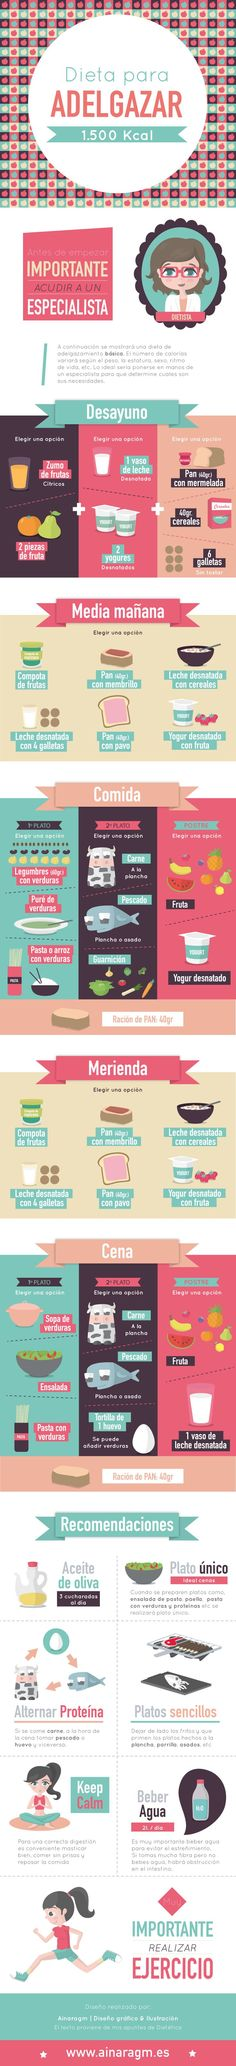 Infografía sobre una dieta de adelgazamiento #dietetica #alimentacion #salud #infografia #diseno #ilustracion: